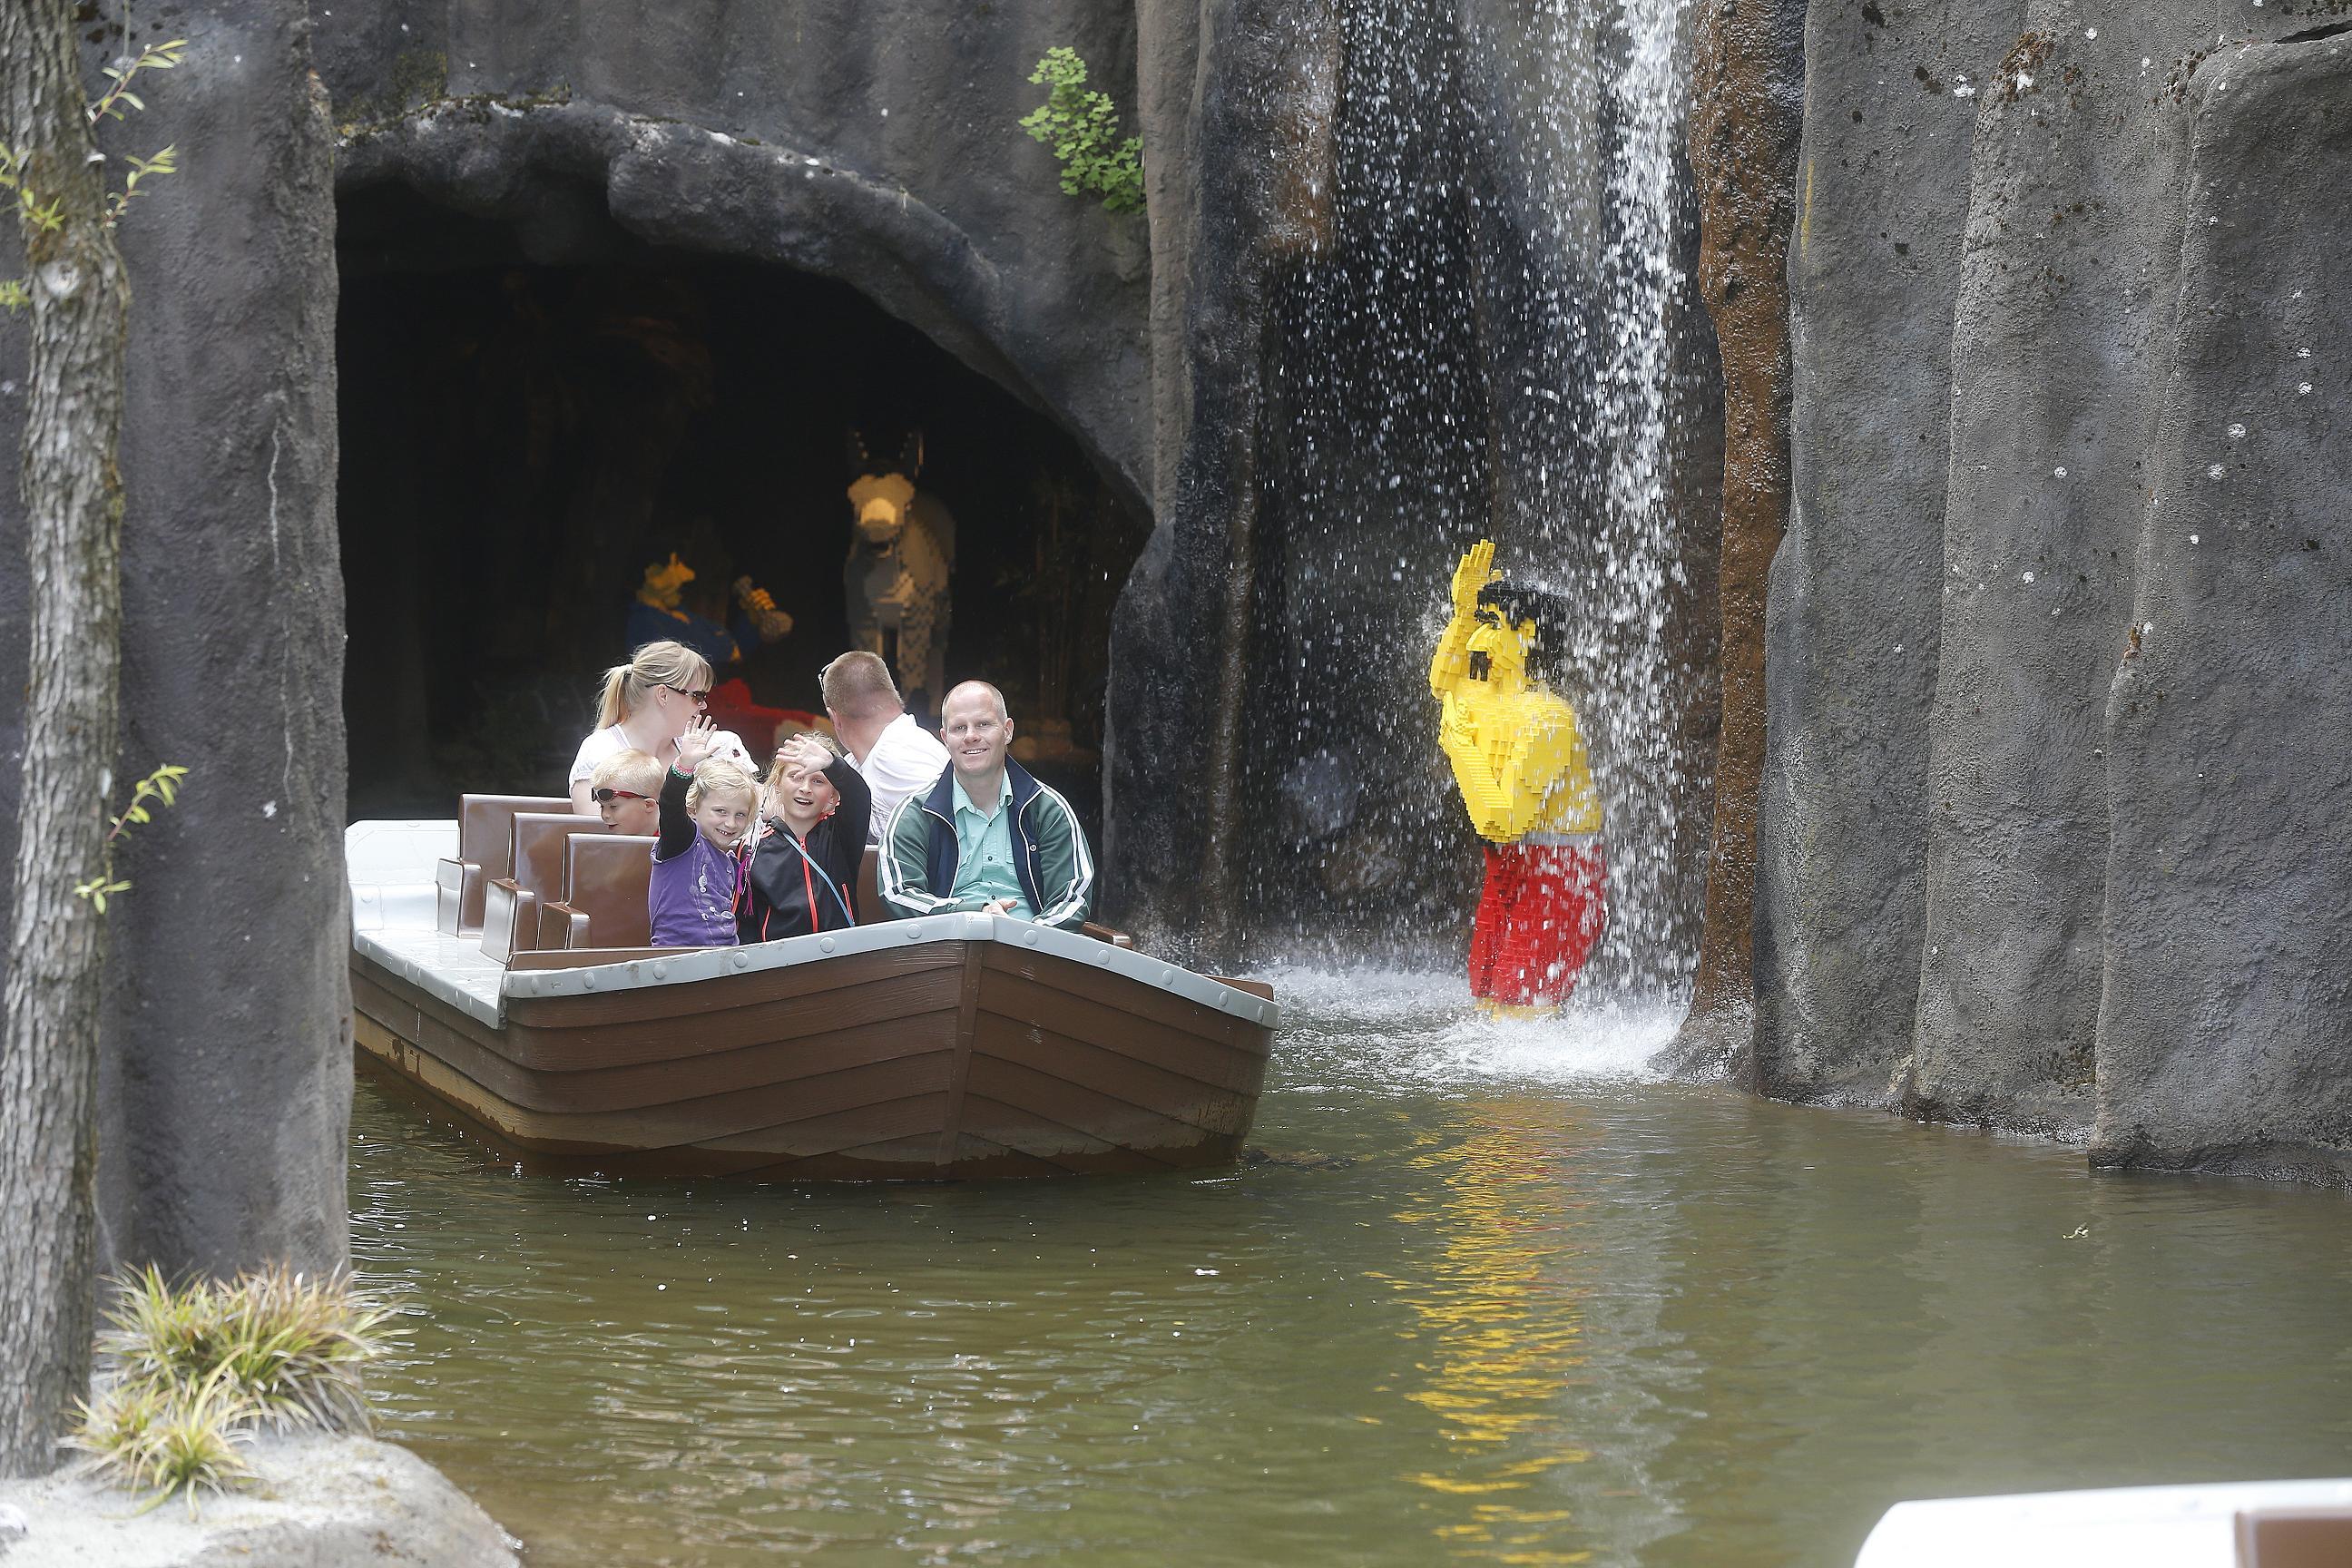 łódki atrakcje Legoland Billund